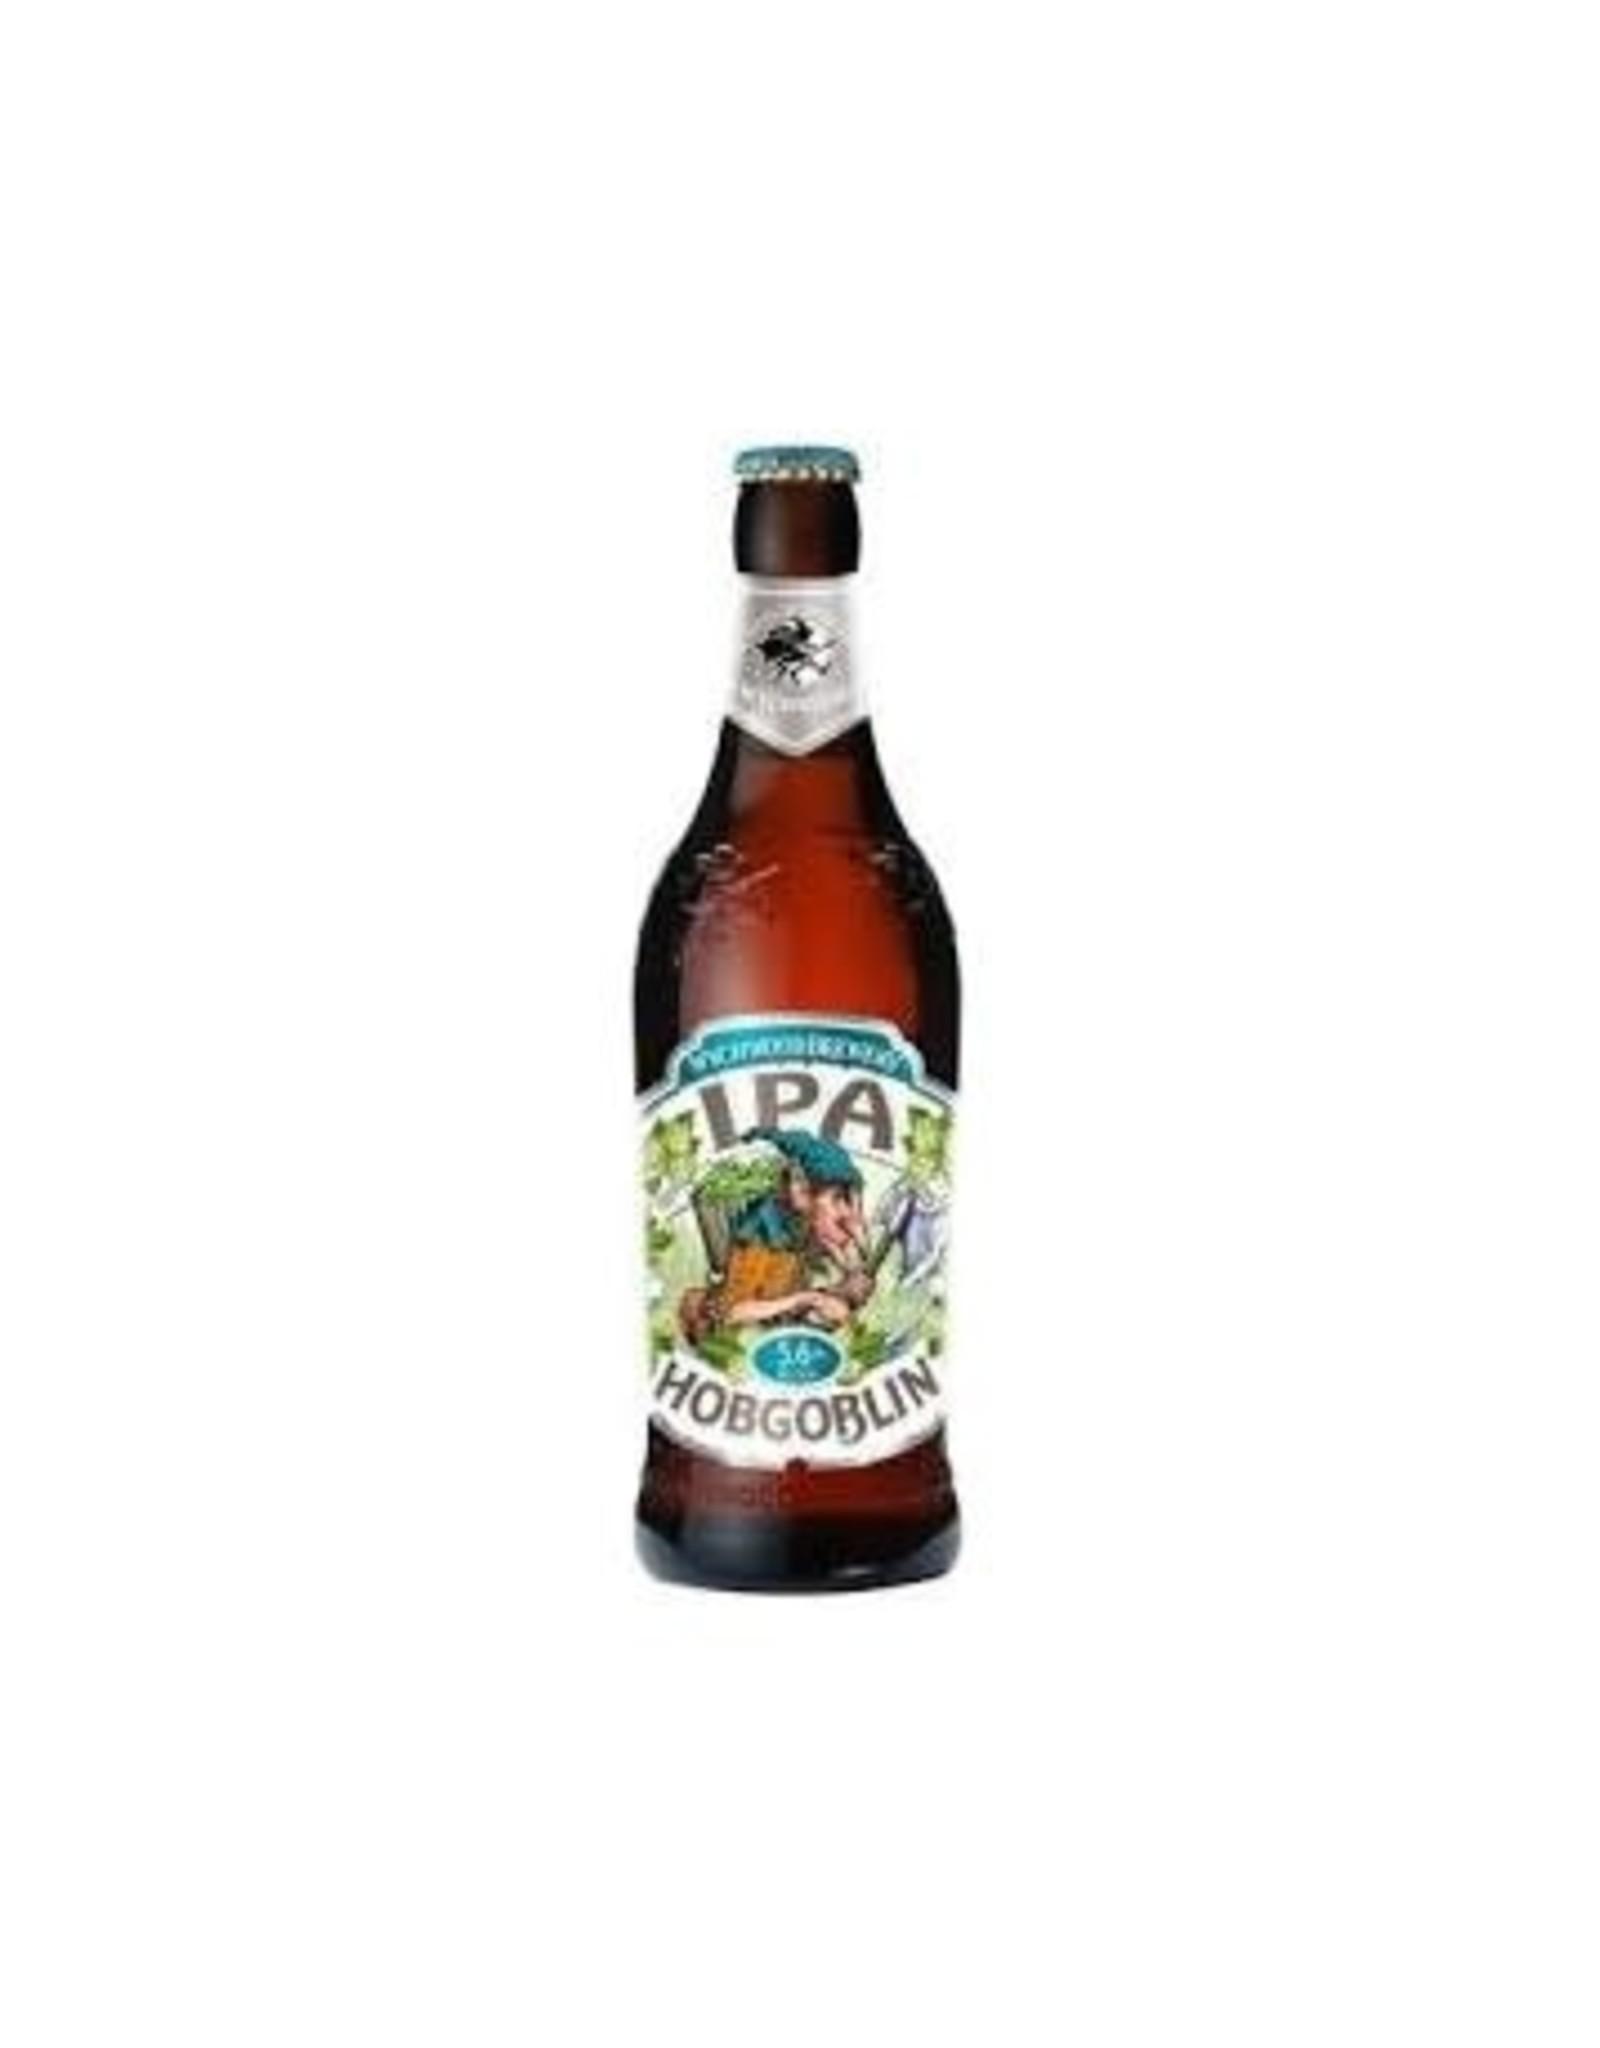 Wychwood Brewery Hobgoblin India Pale Ale 50 cl